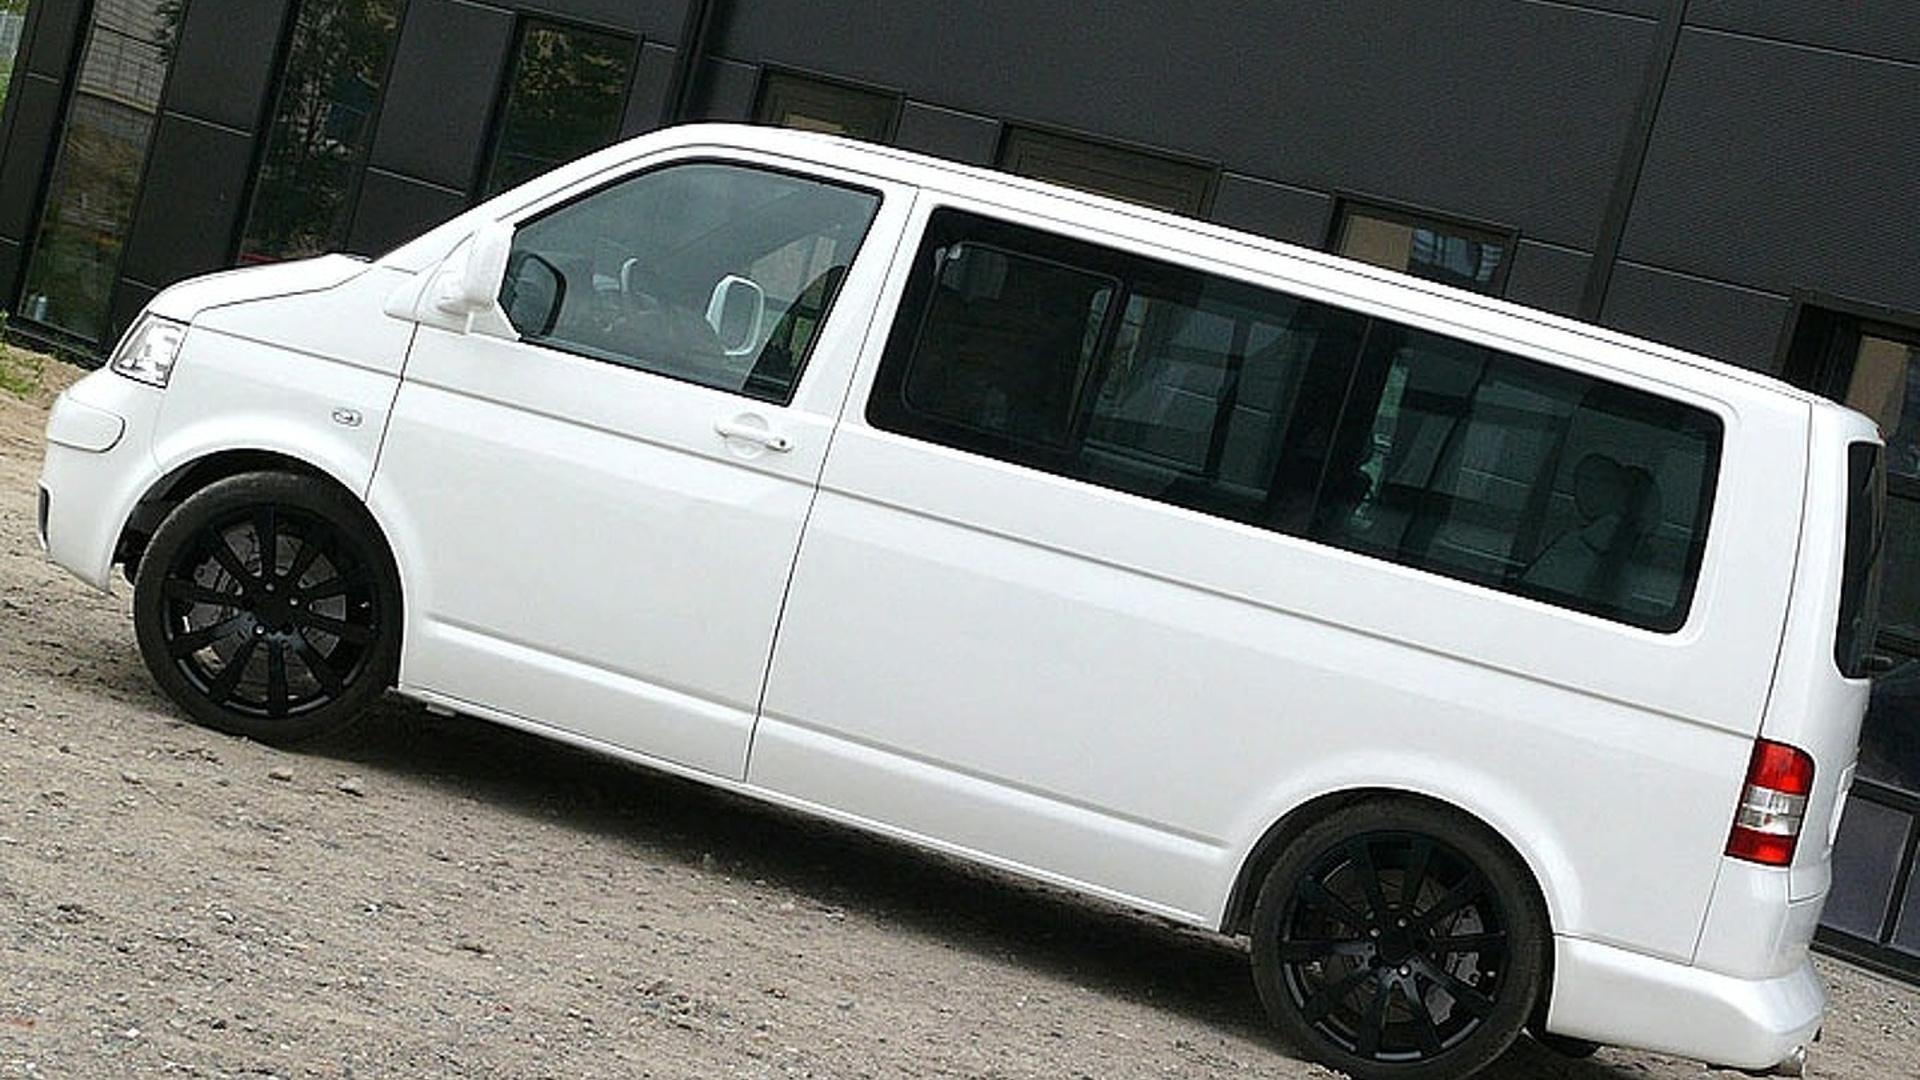 volkswagen t5 van with 558ps porsche 996 engine by th auto. Black Bedroom Furniture Sets. Home Design Ideas